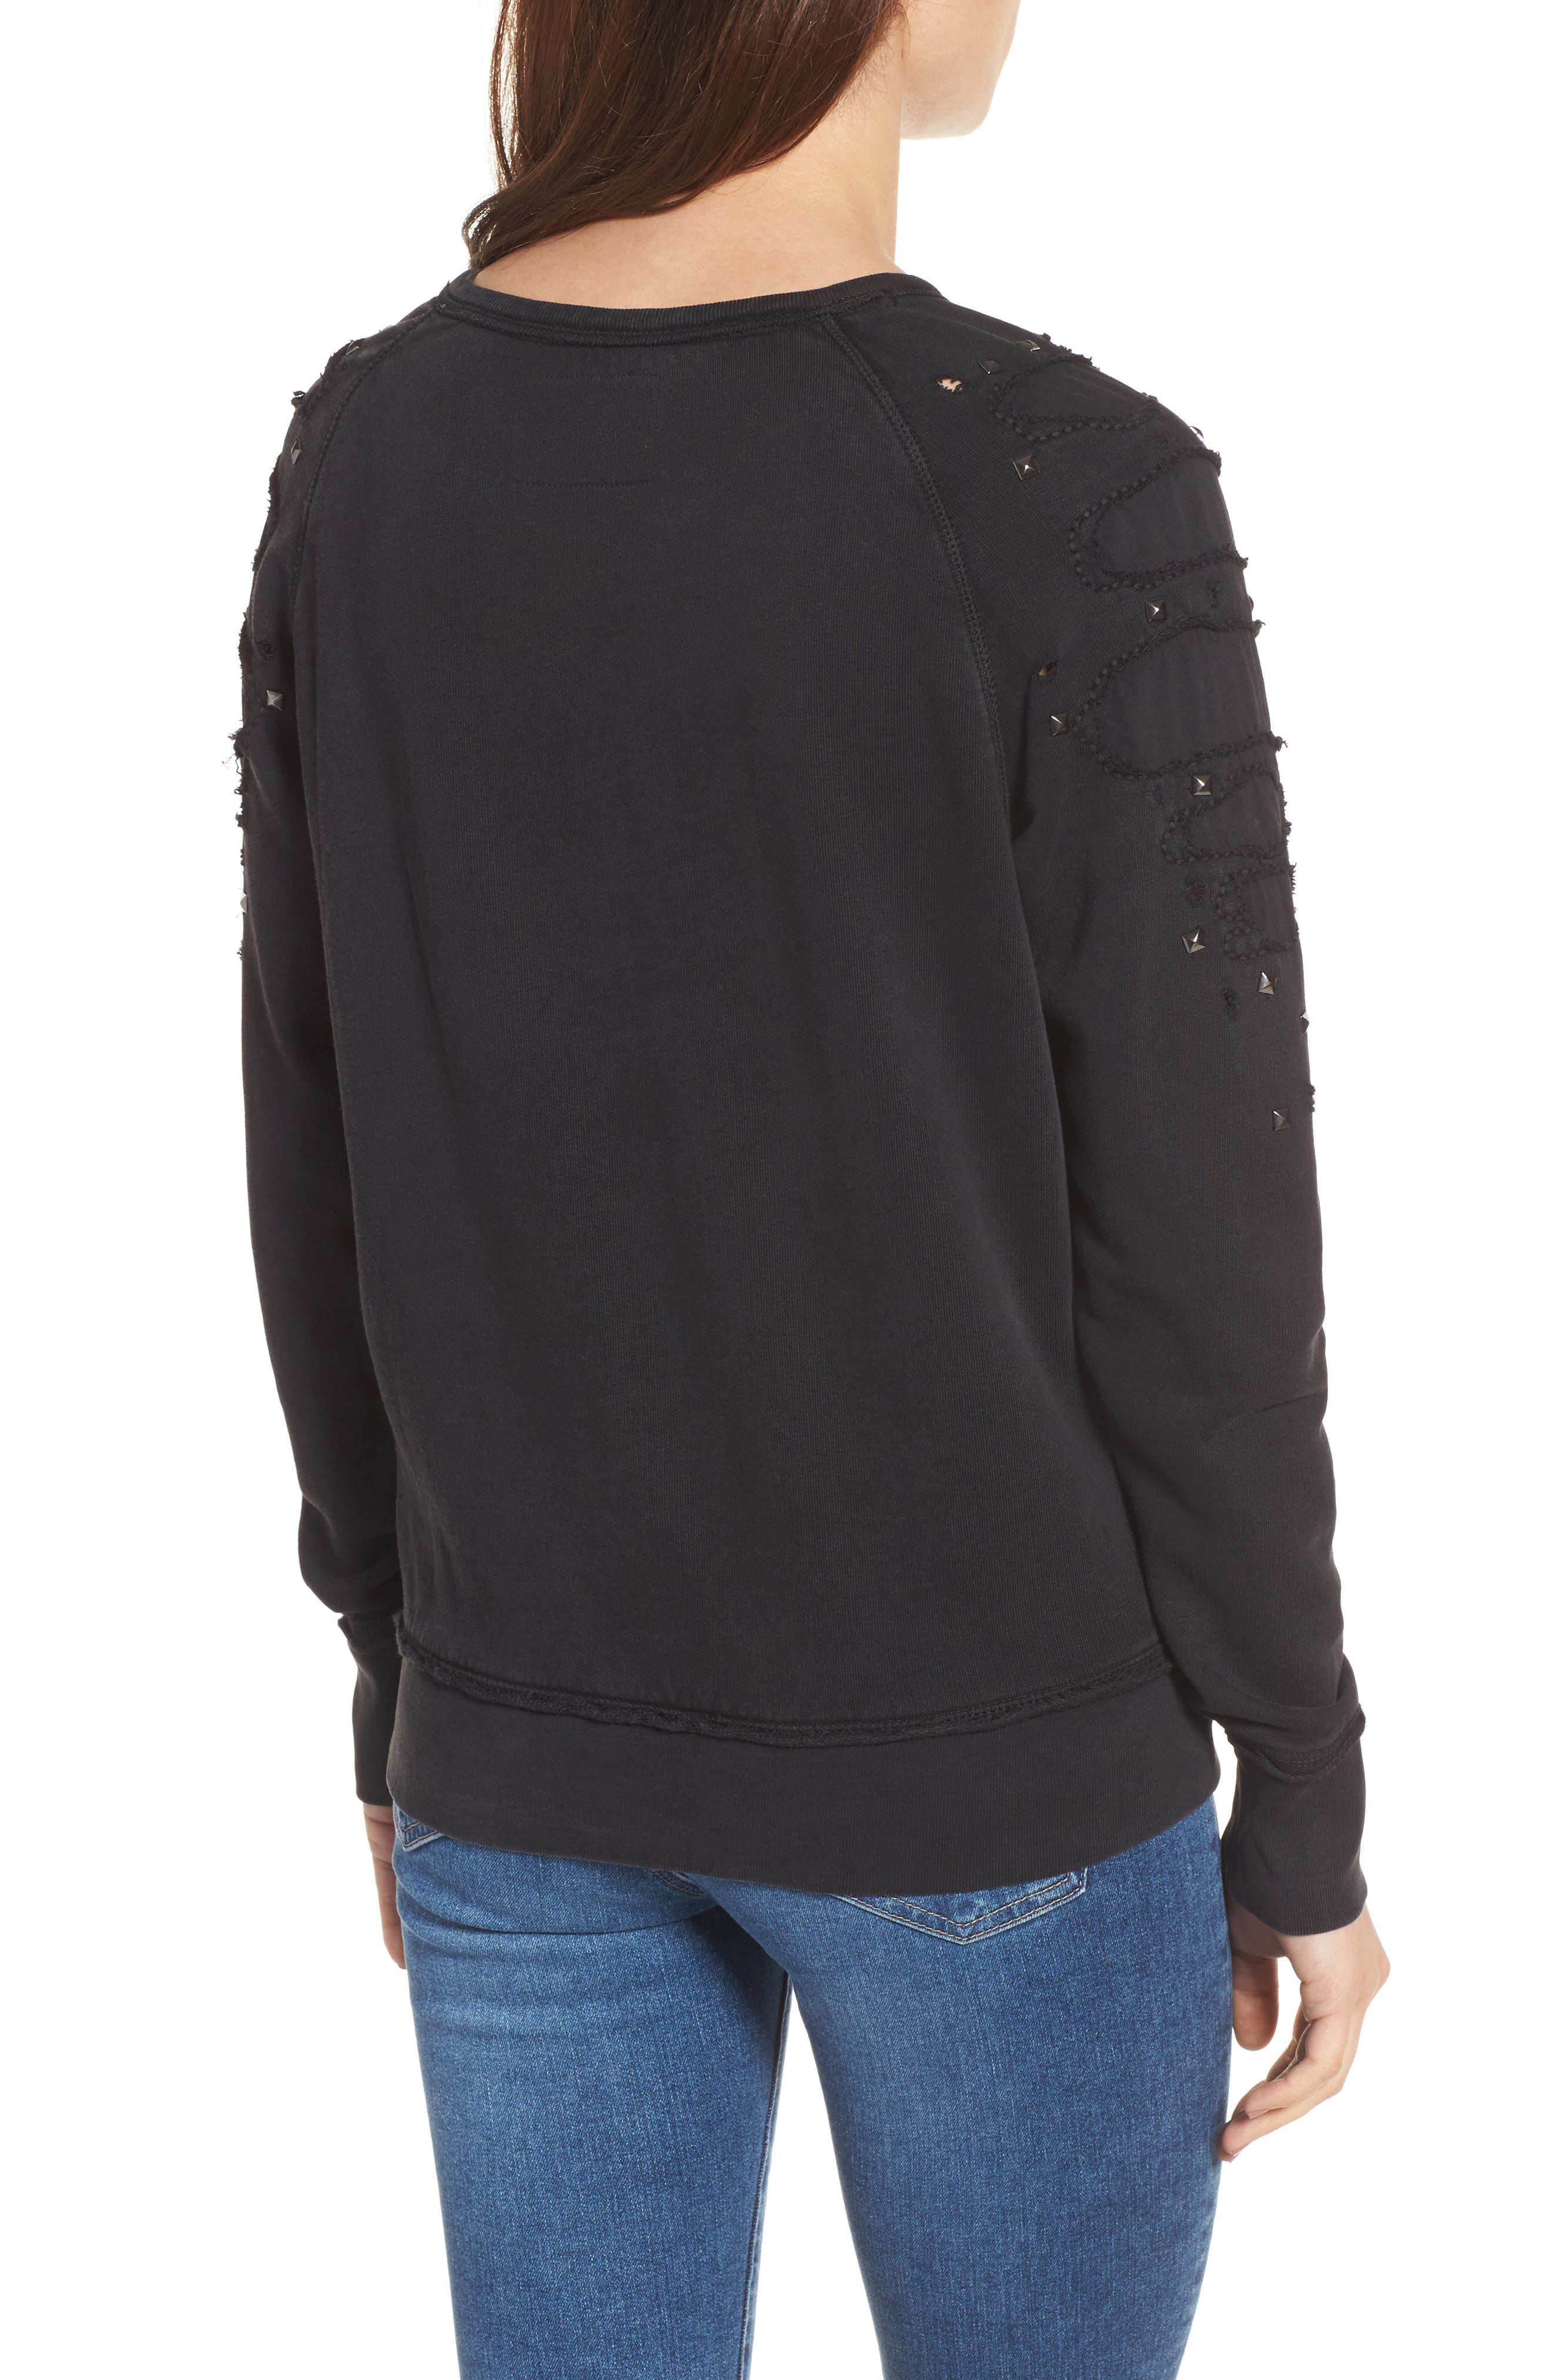 Distressed Boyfriend Sweatshirt,                             Alternate thumbnail 2, color,                             001